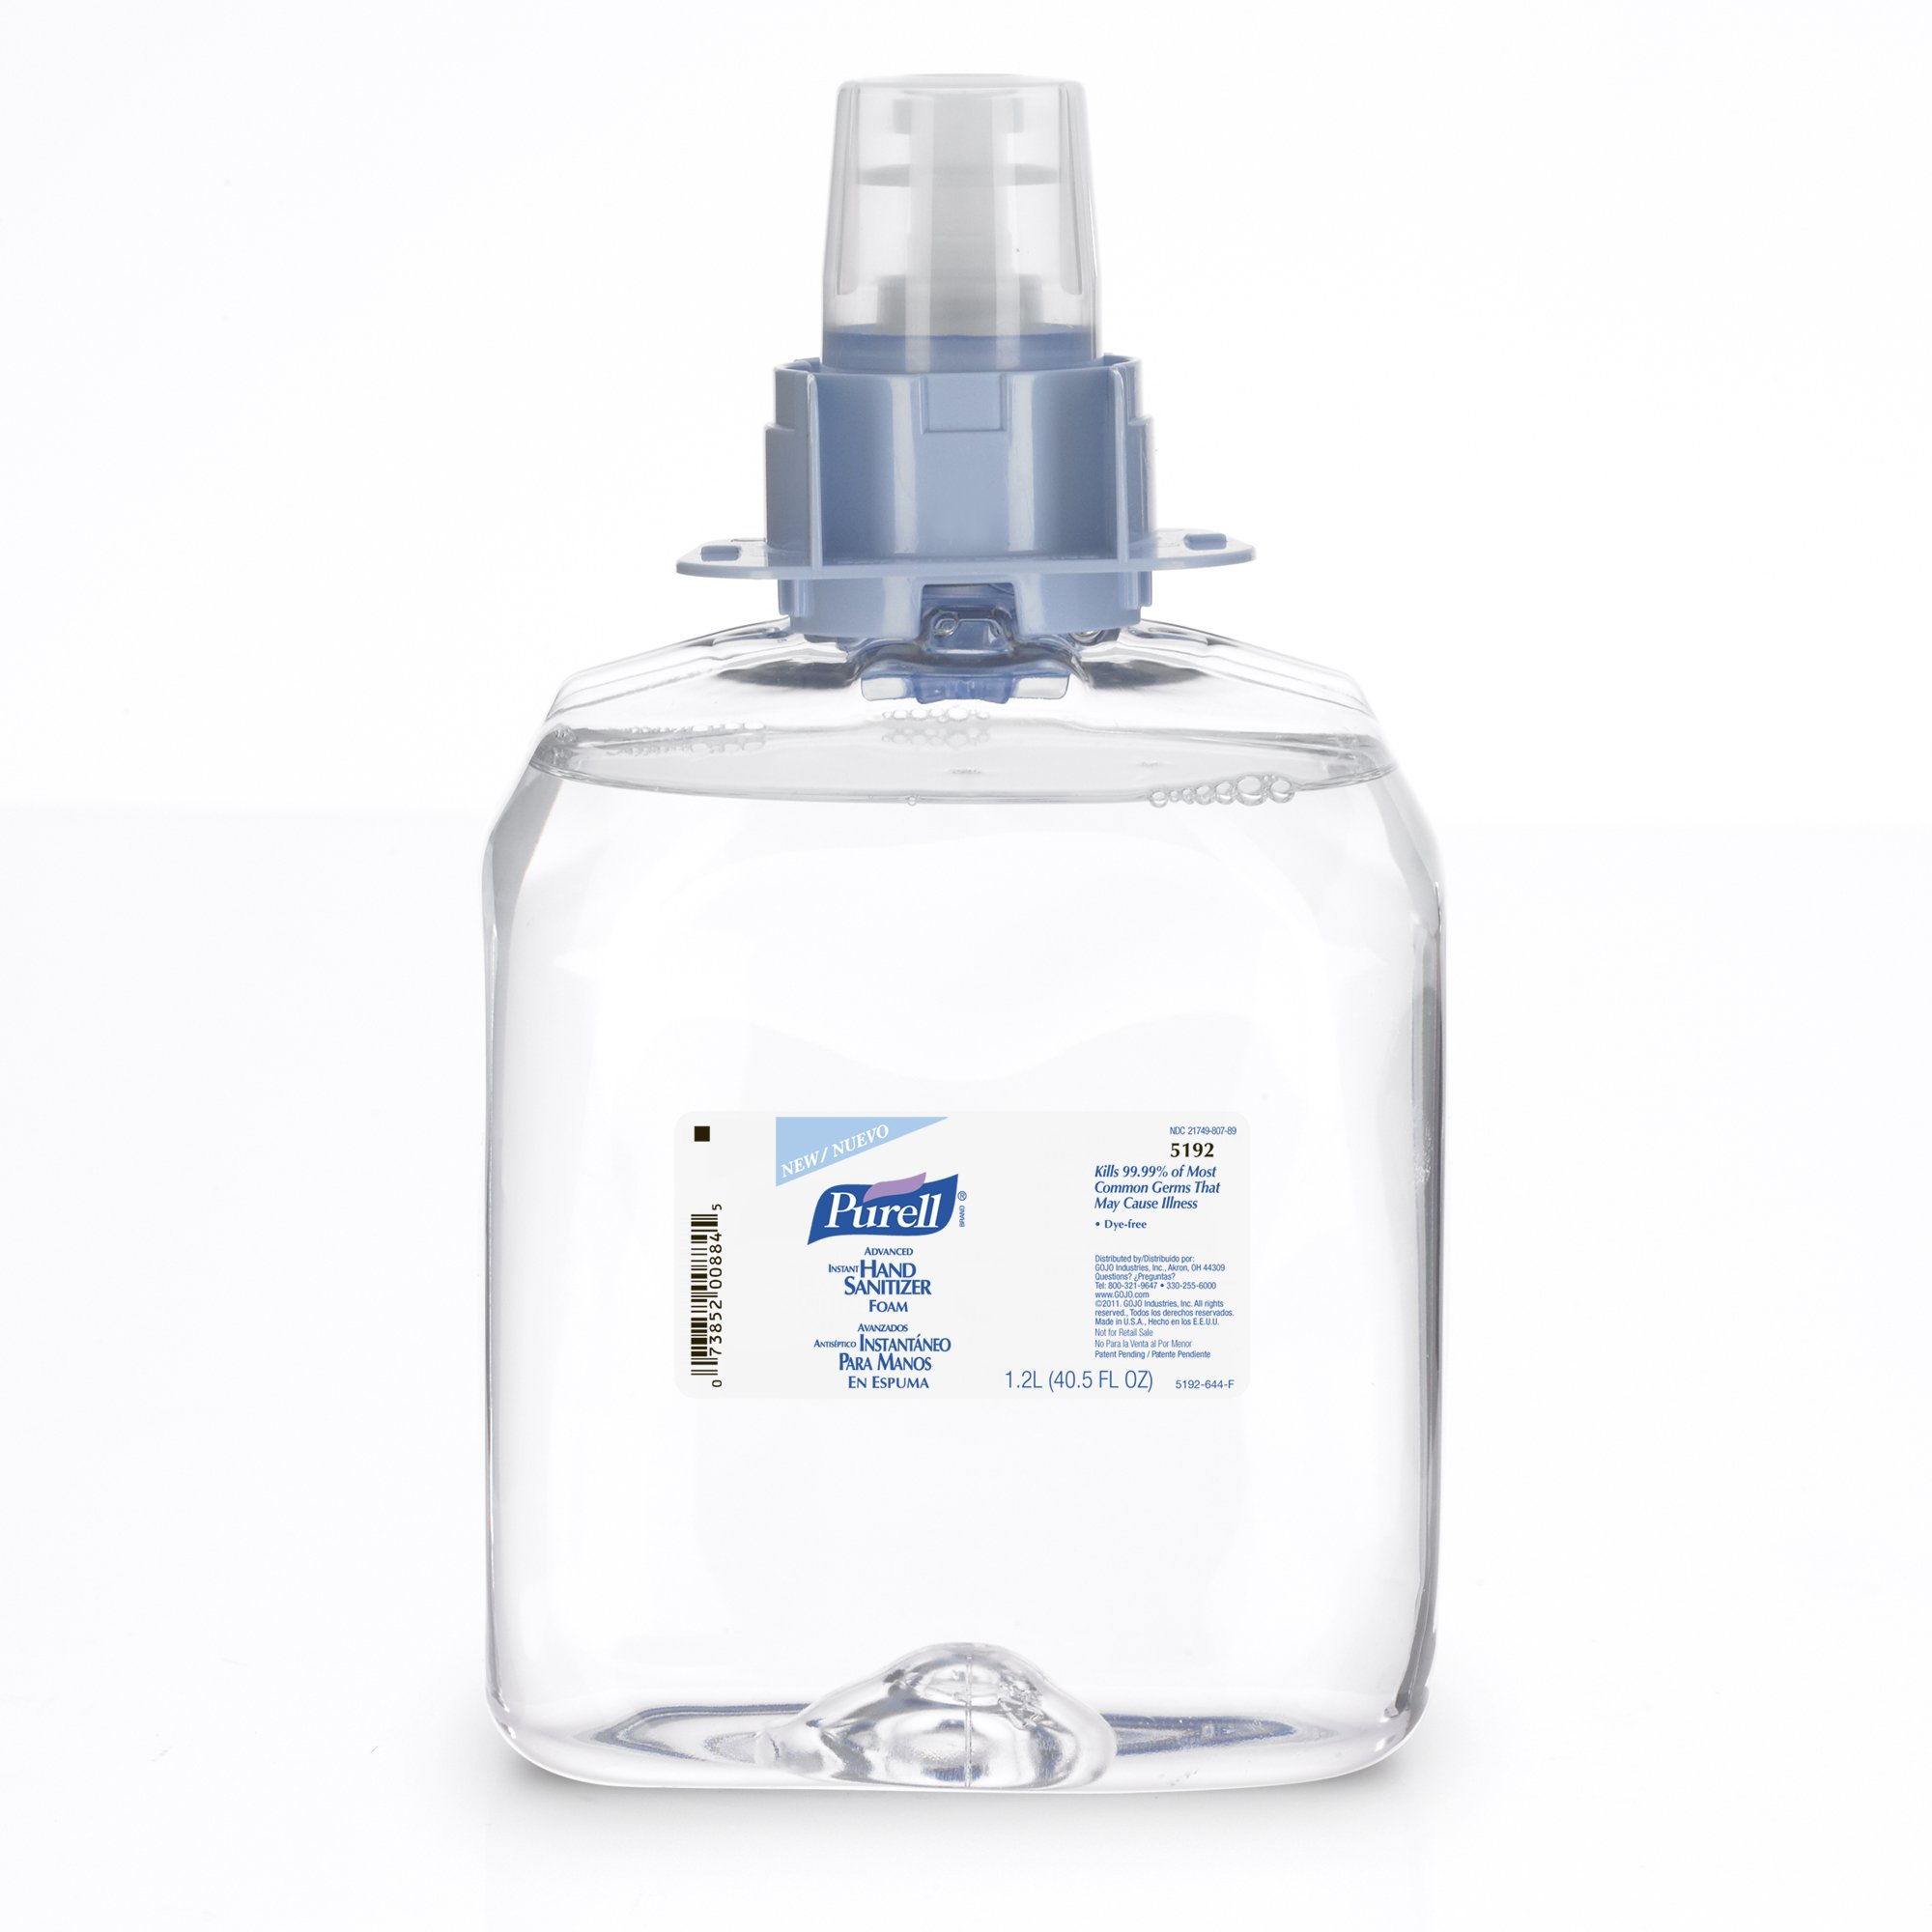 PURELL Advanced Hand Sanitizer Foam, 1200 mL Foam Hand Sanitizer Refill for PURELL FMX-12 Push-Style Dispenser (Pack of 3) - 5192-03 by Purell